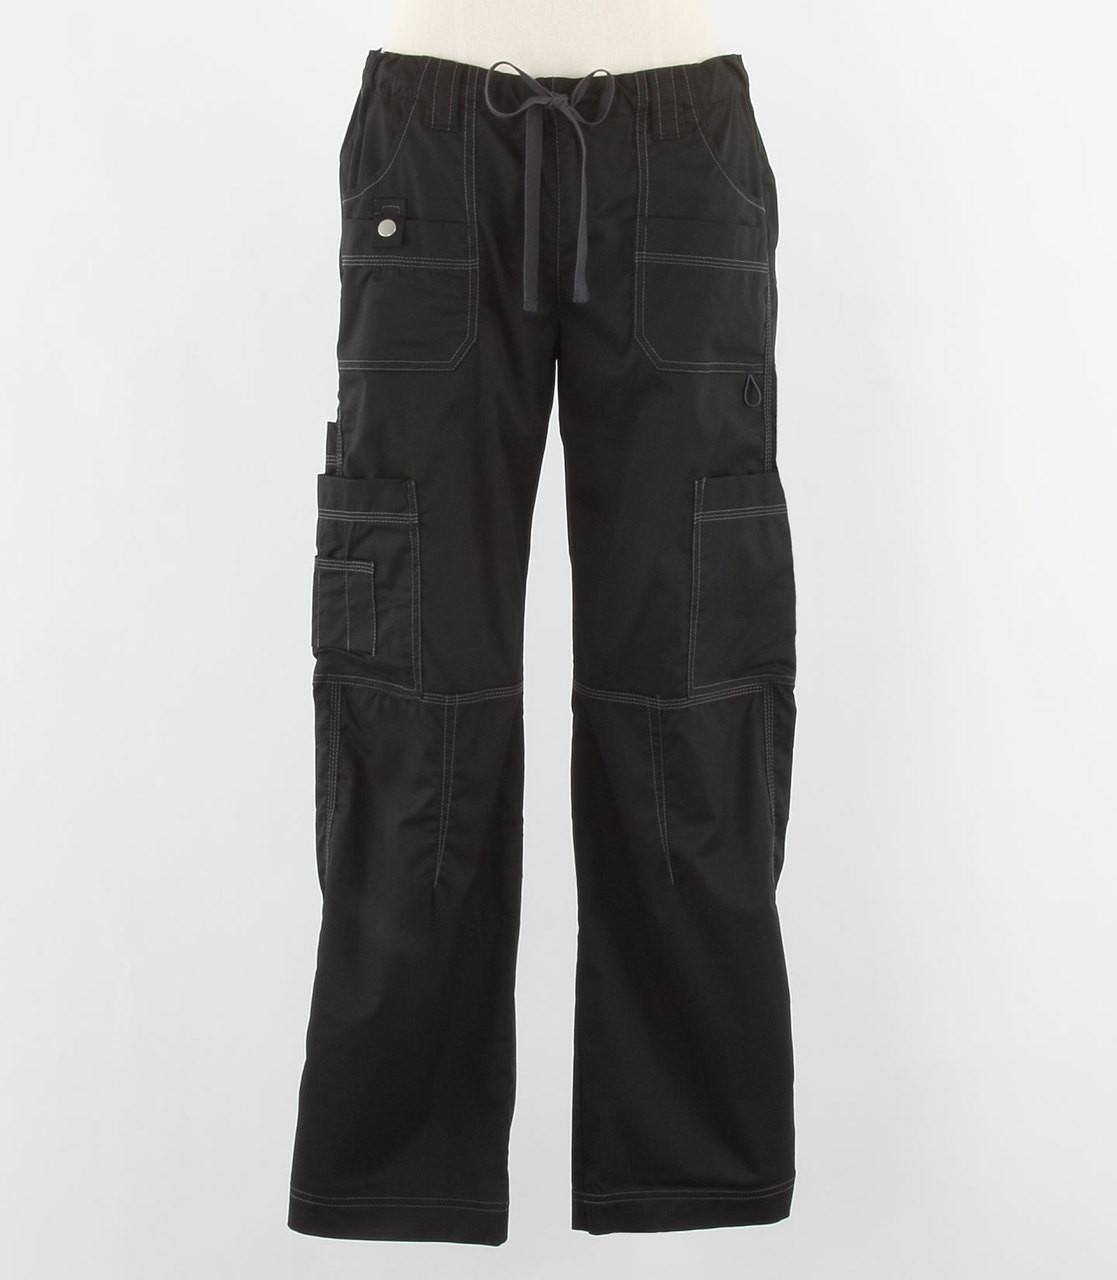 8167f6f6a7b Dickies Gen Flex Womens Cargo Scrub Pants Black - Petite - Scrub Med